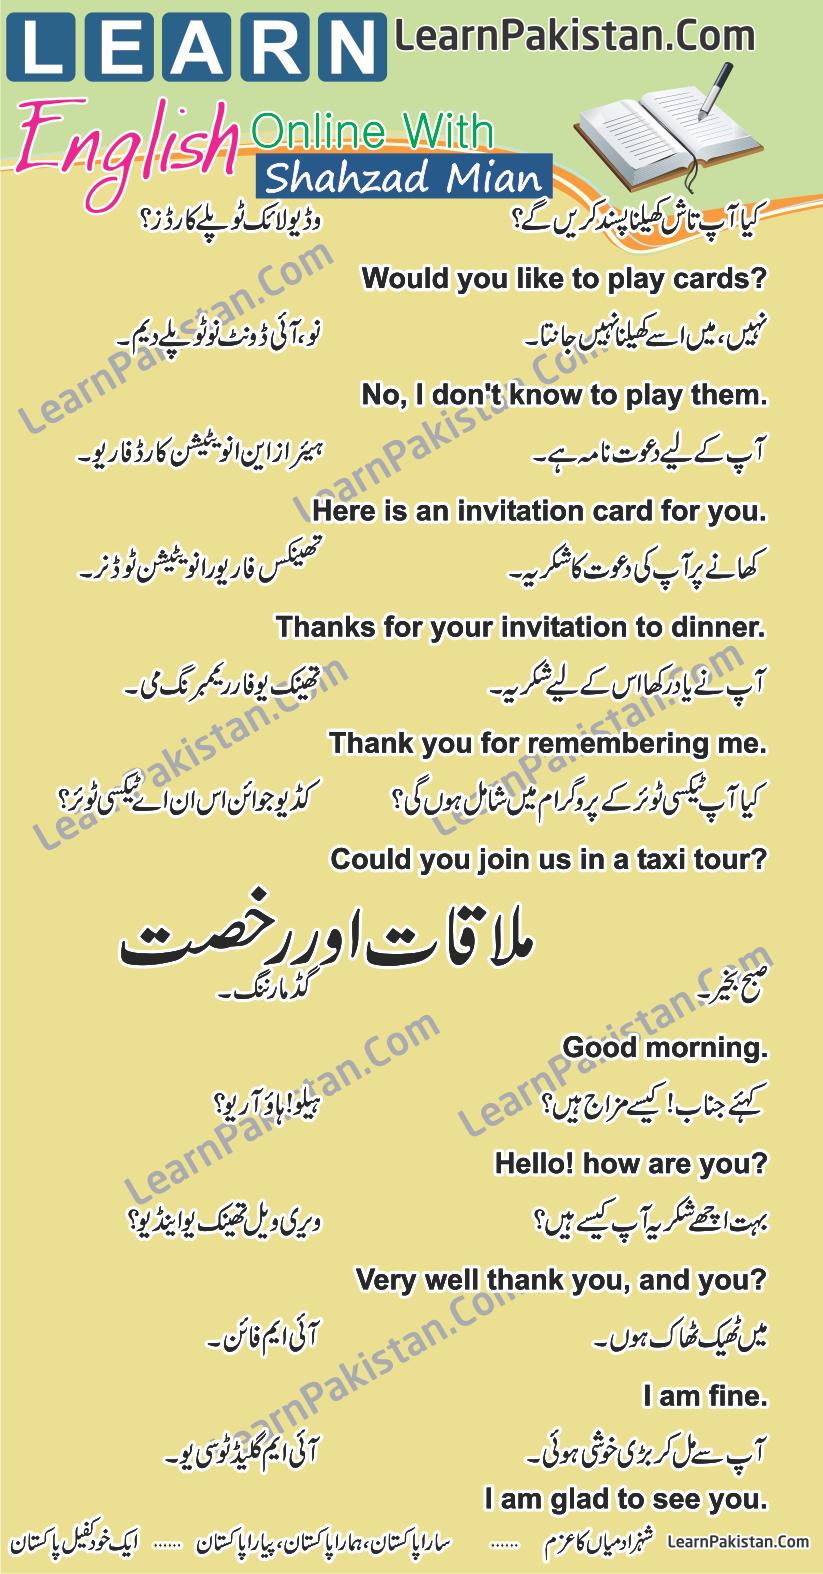 How To Speak English From Urdu Common English Sentences